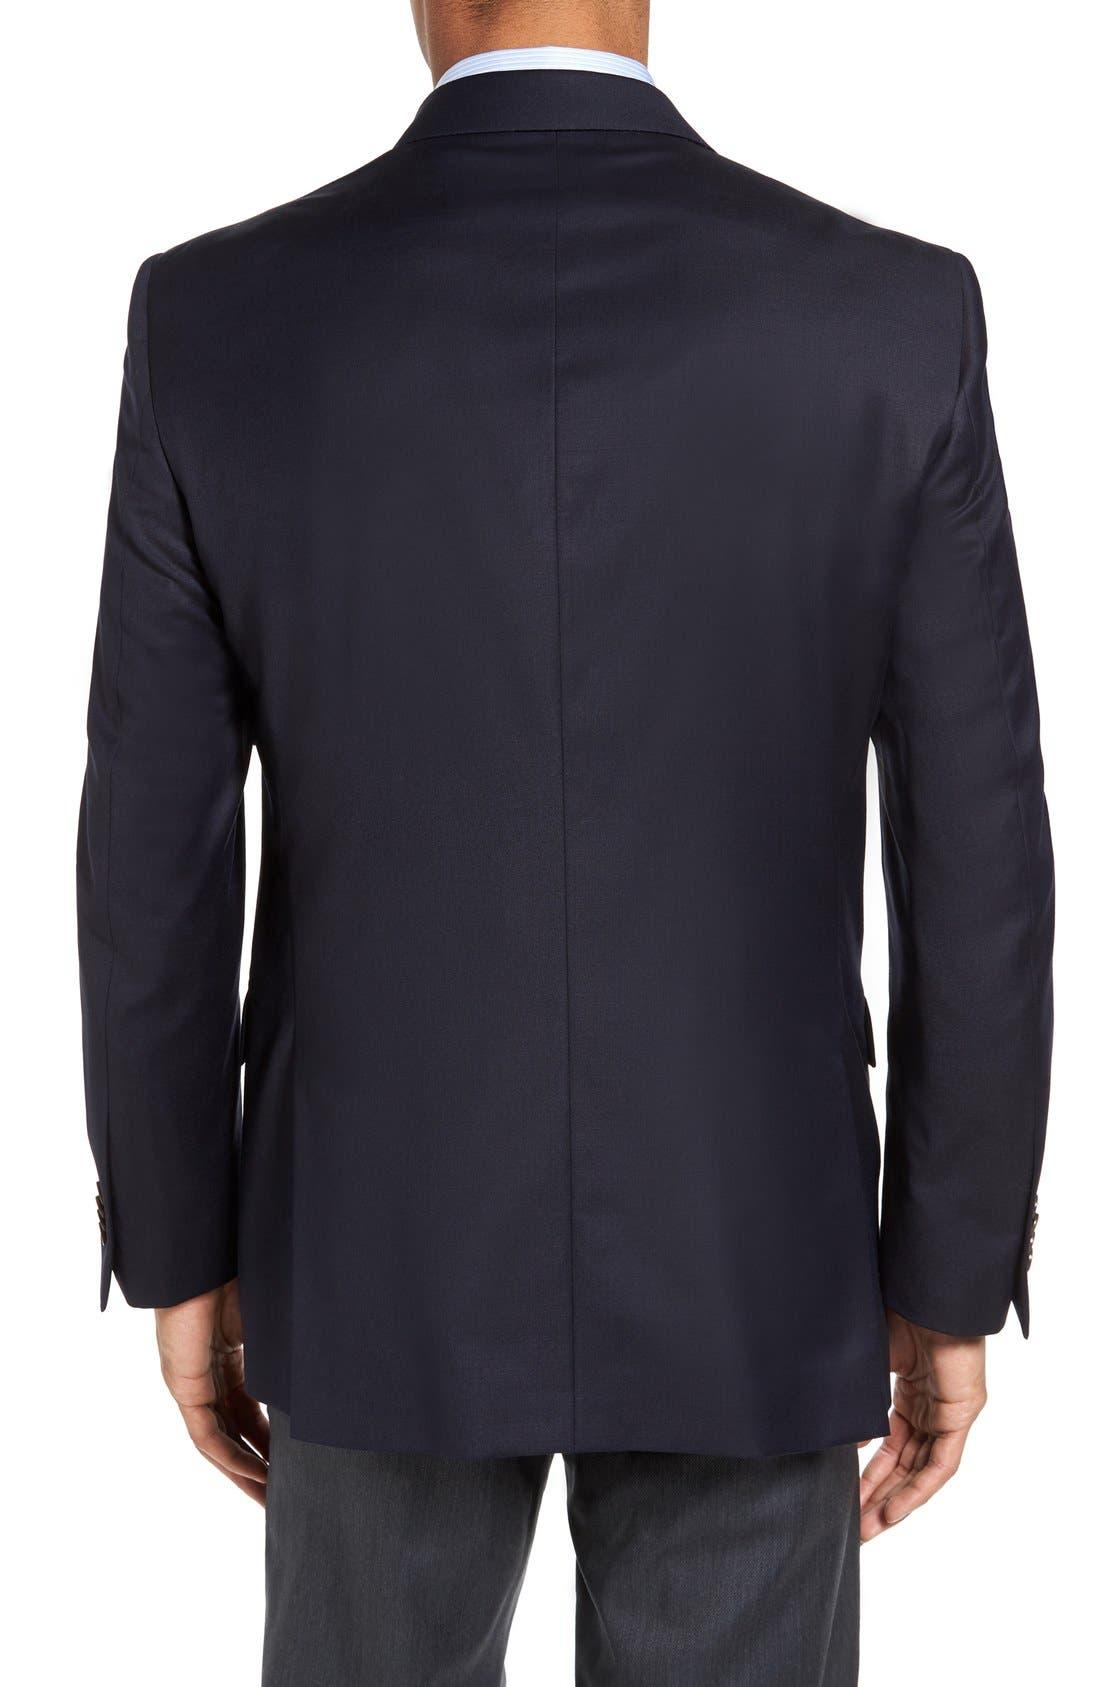 Alternate Image 2  - Peter Millar 'Flynn' Classic Fit Navy Wool Blazer